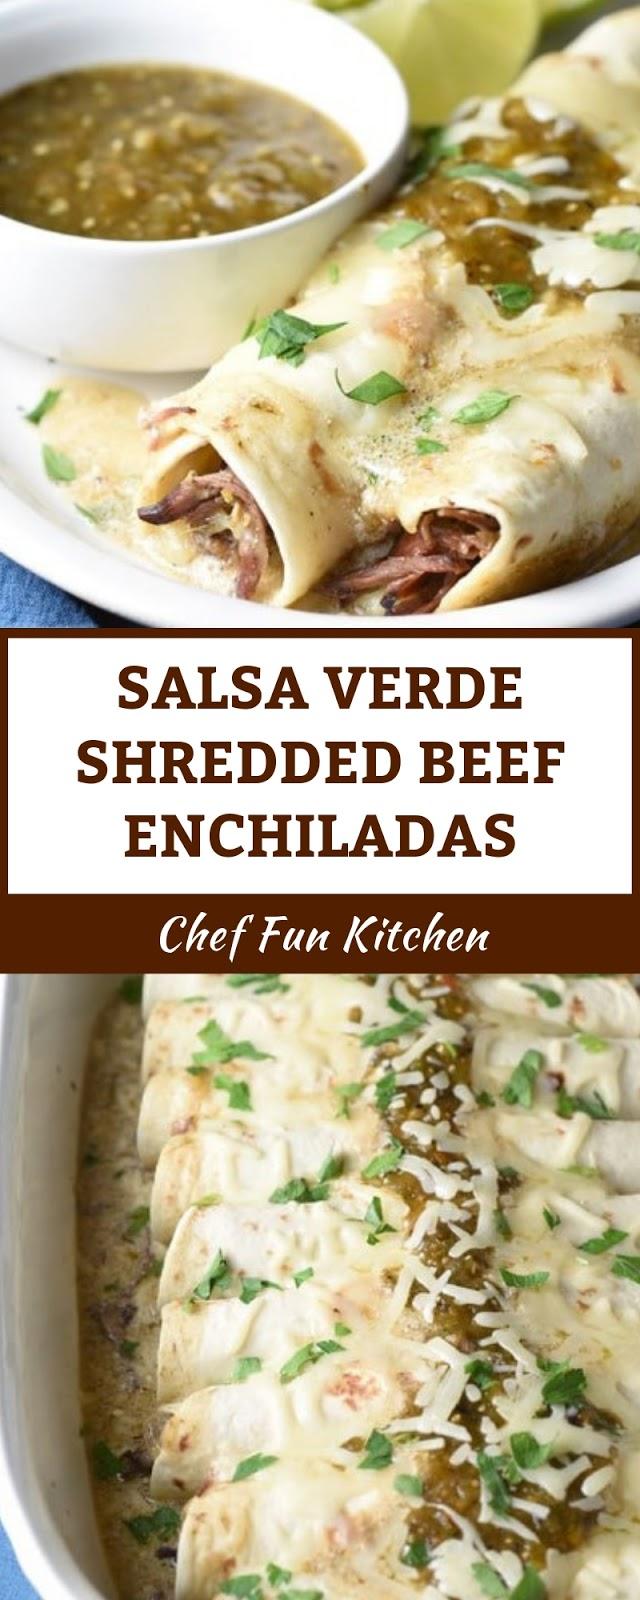 SALSA VERDE SHREDDED BEEF ENCHILADAS